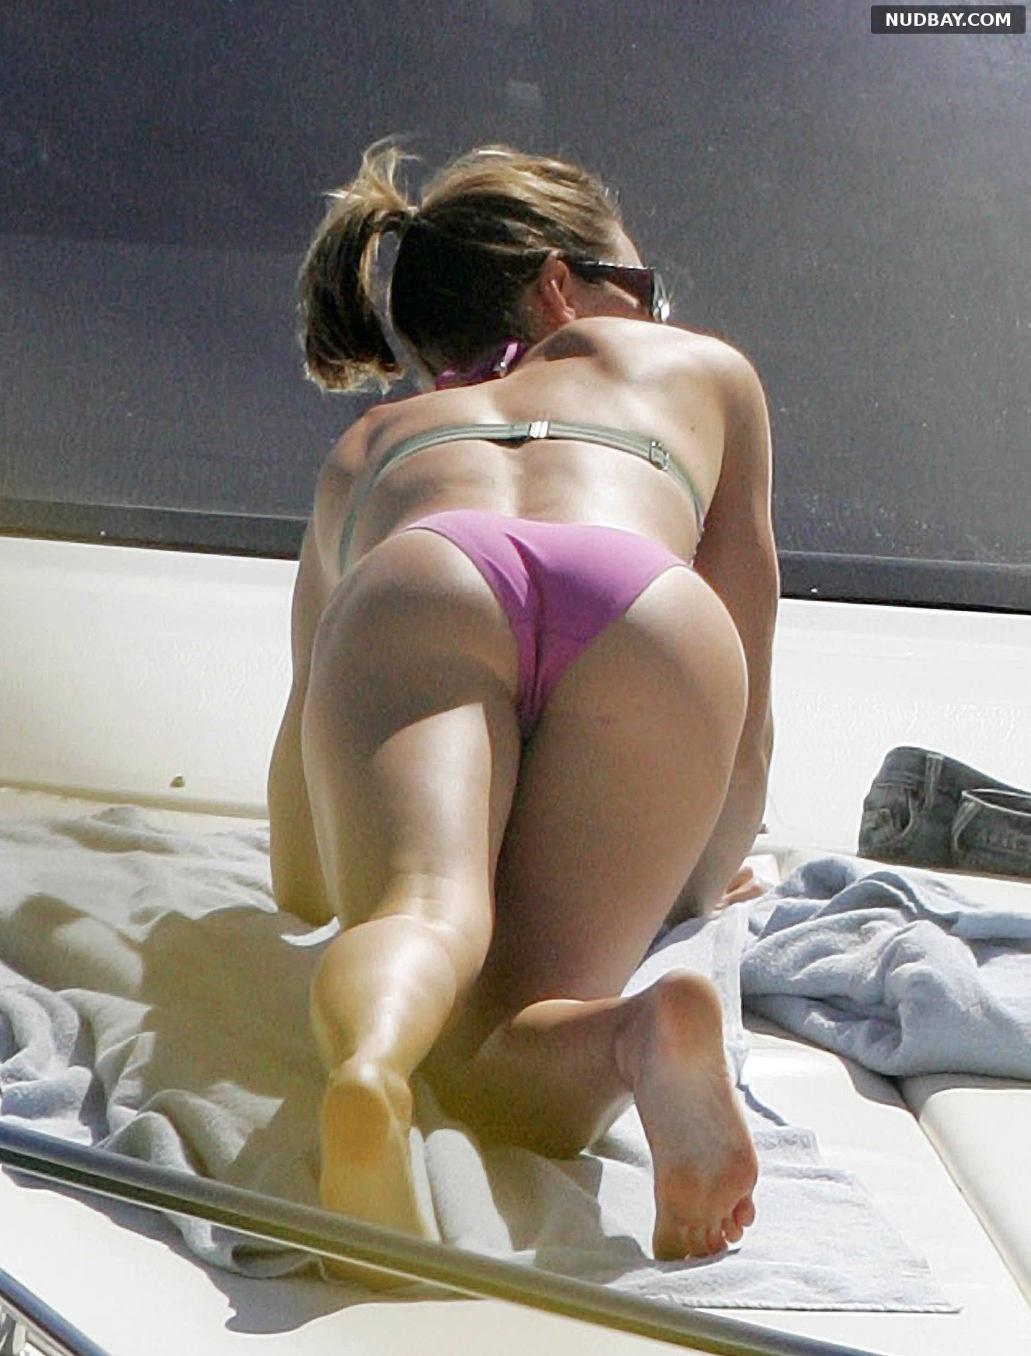 Jessica Biel Ass in Bikini in Puerto Rico Jan 2007